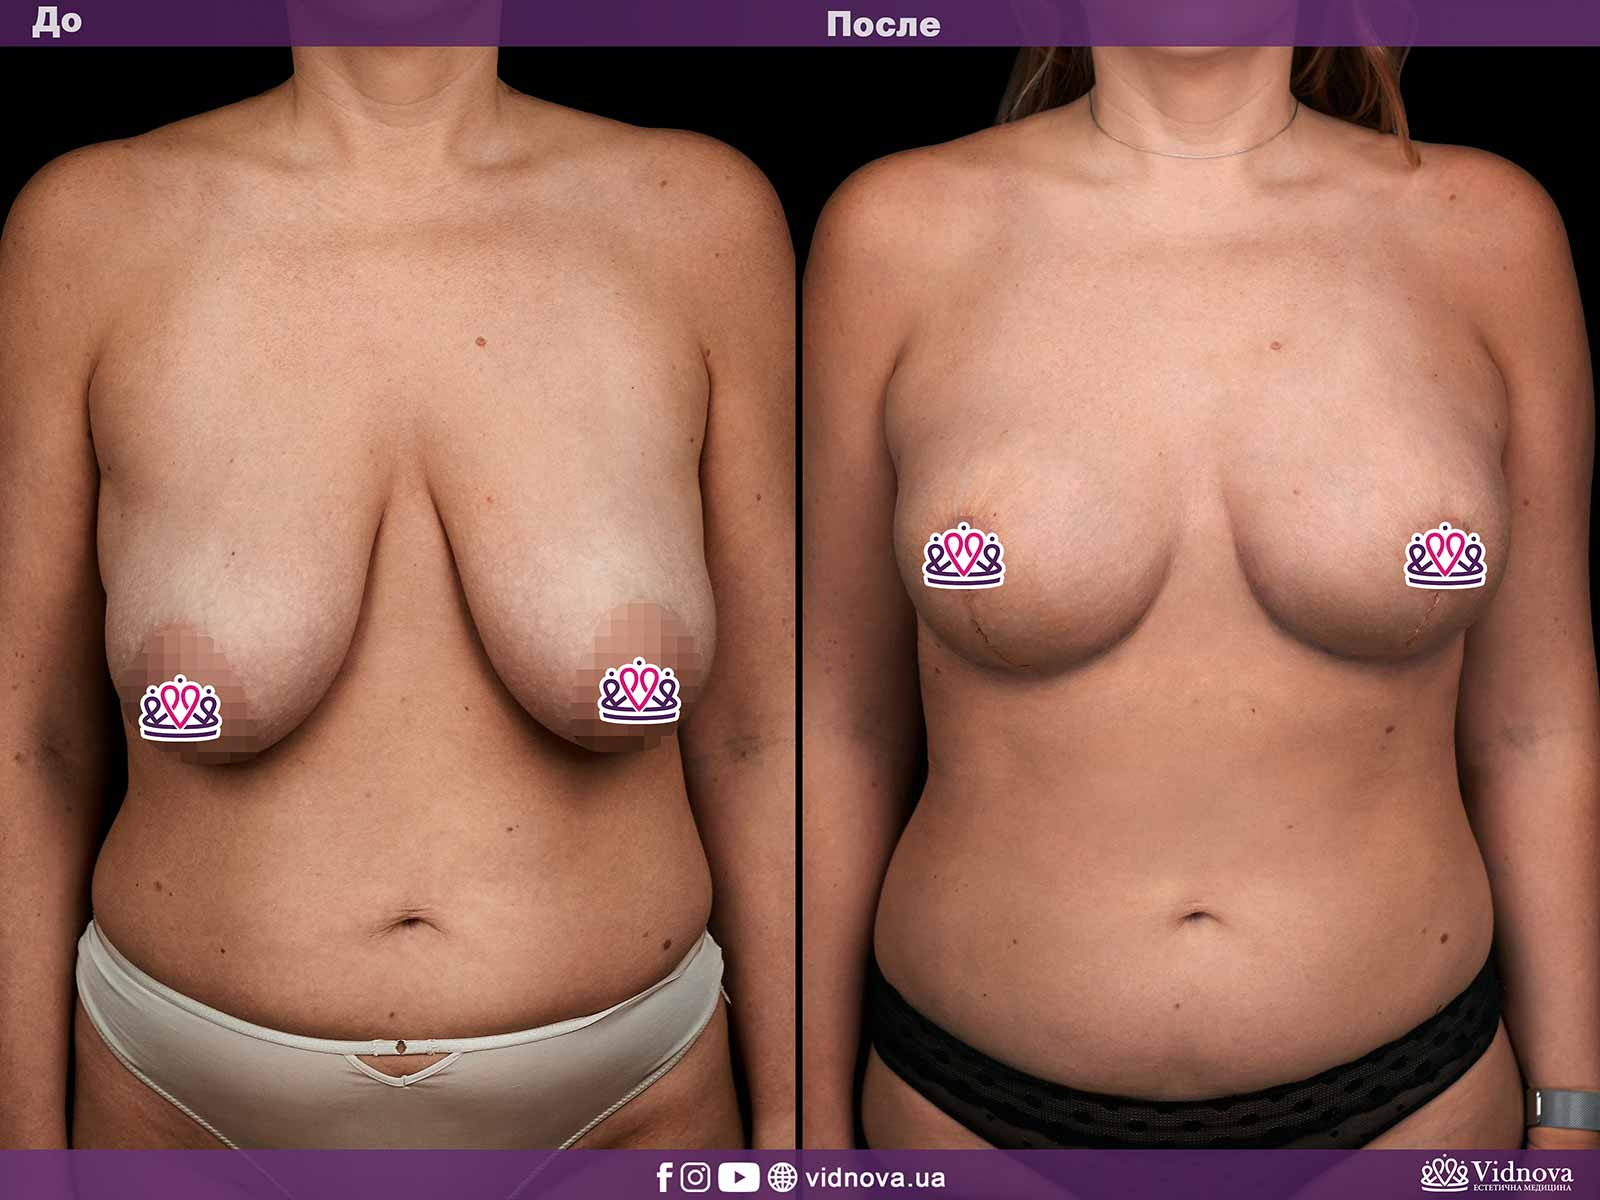 Подтяжка груди: Фото ДО и ПОСЛЕ - Пример №4-1 - Клиника Vidnova